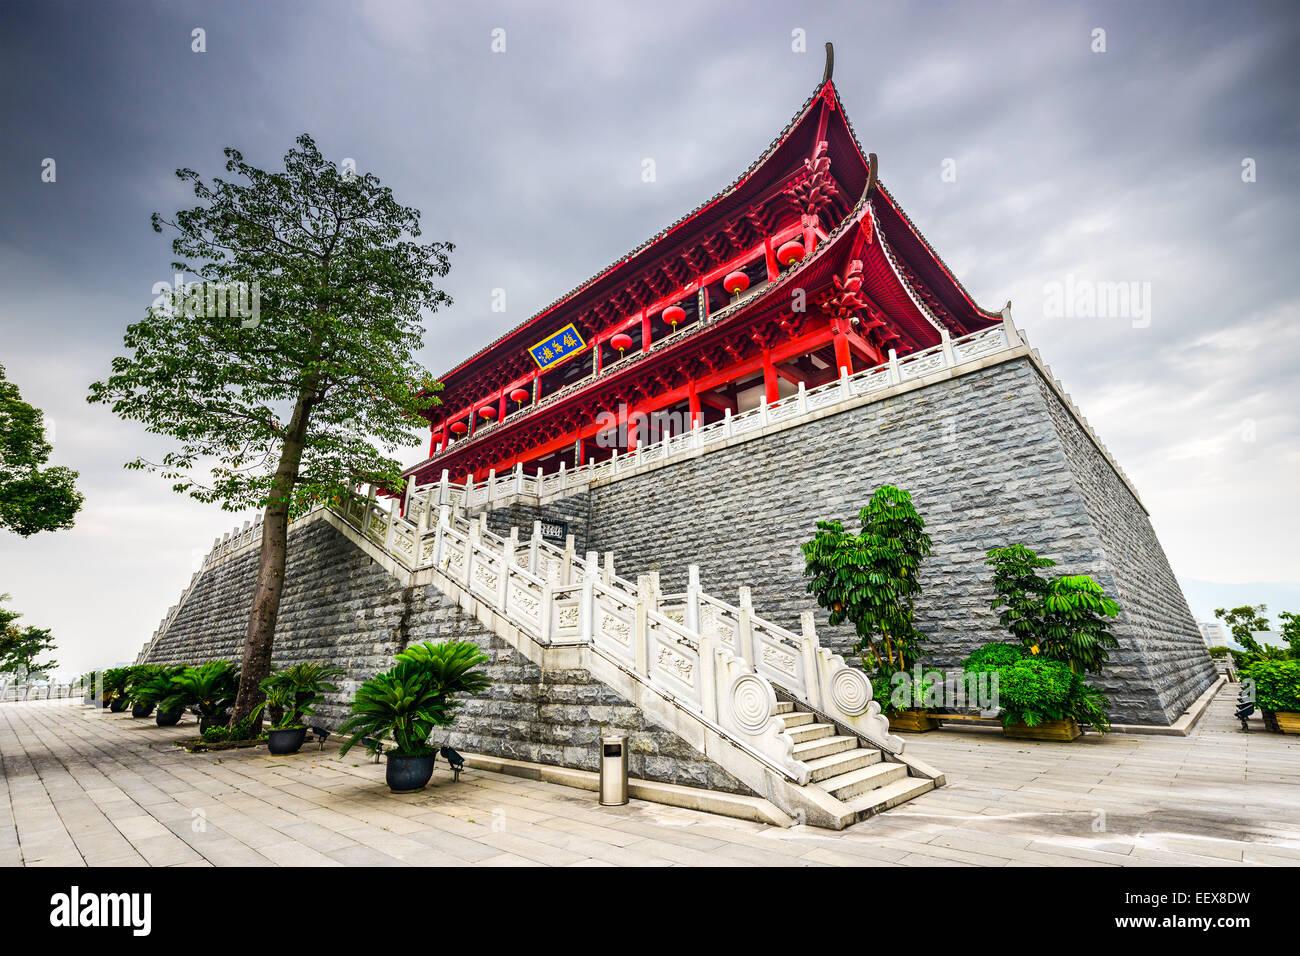 Fuzhou, Cina presso la storica Torre Zhenhai. Immagini Stock